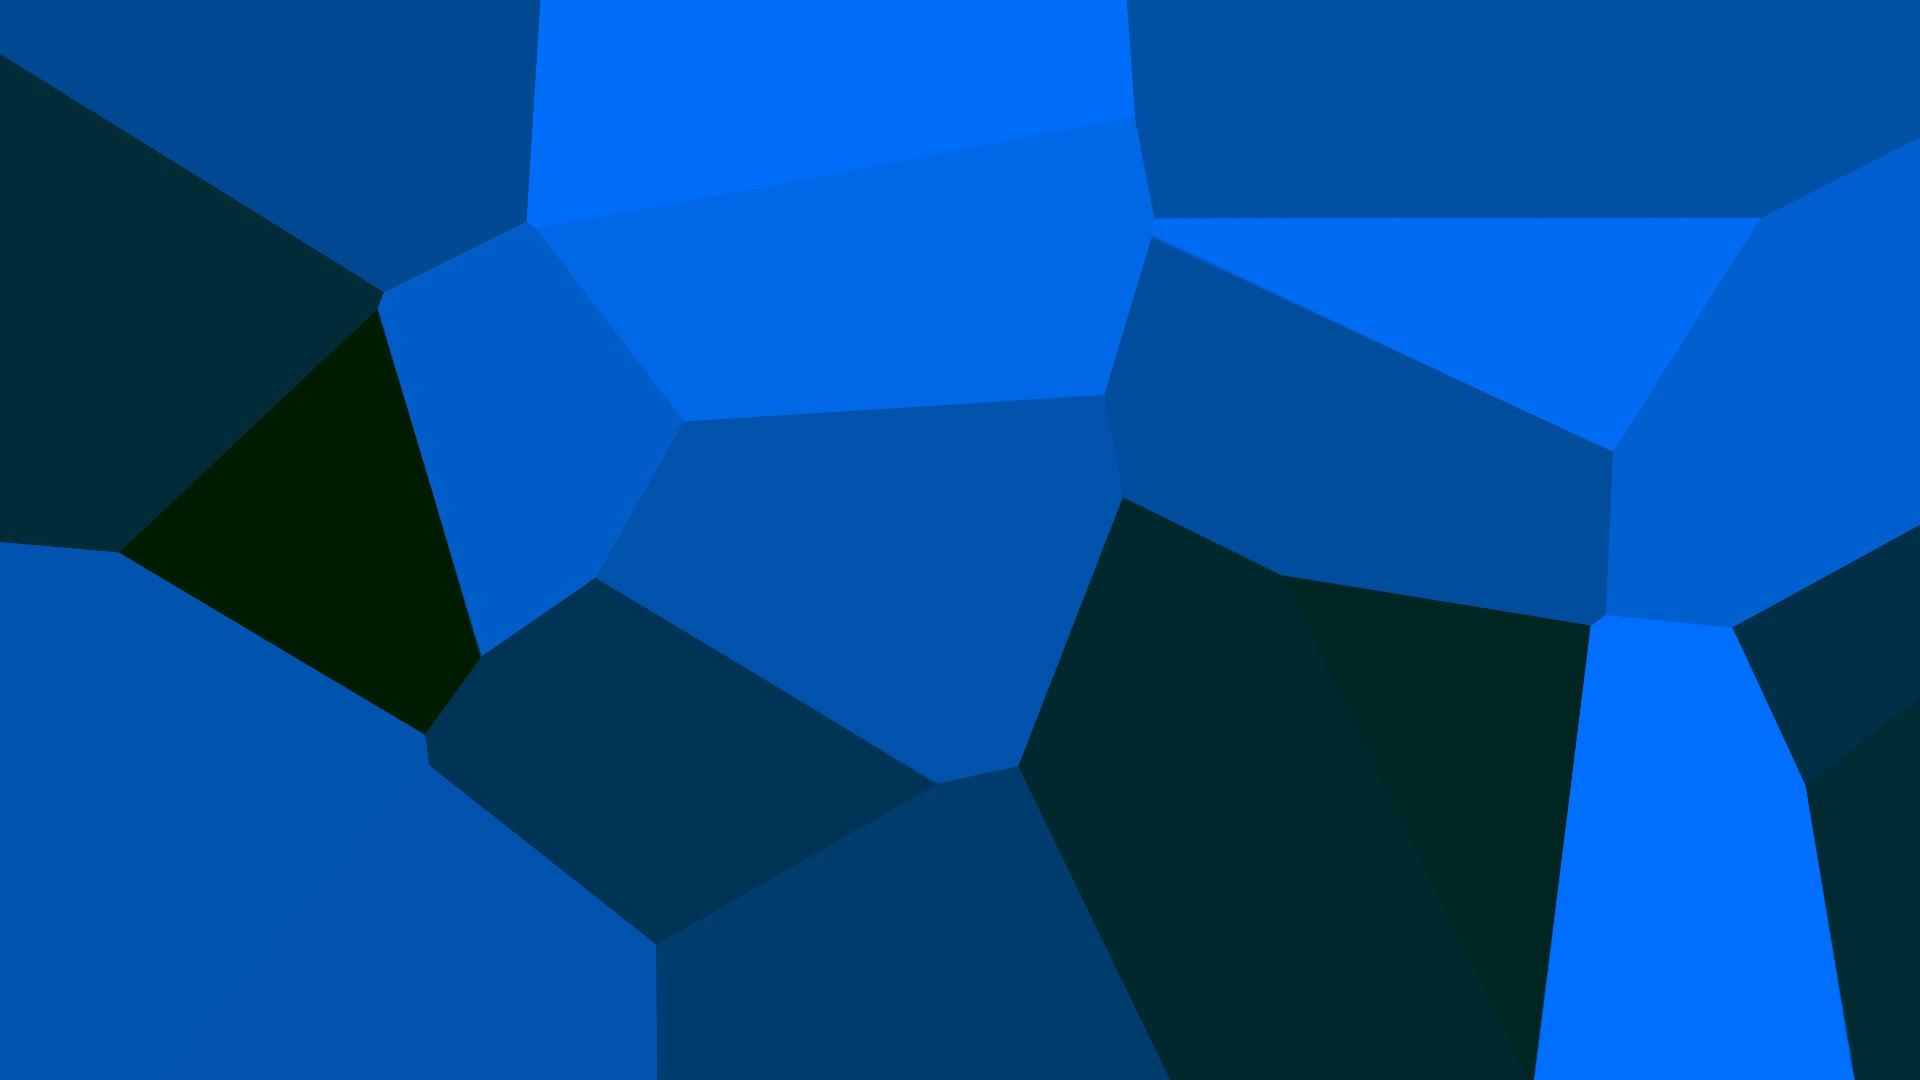 wallpapers flat,blue,cobalt blue,azure,electric blue,turquoise